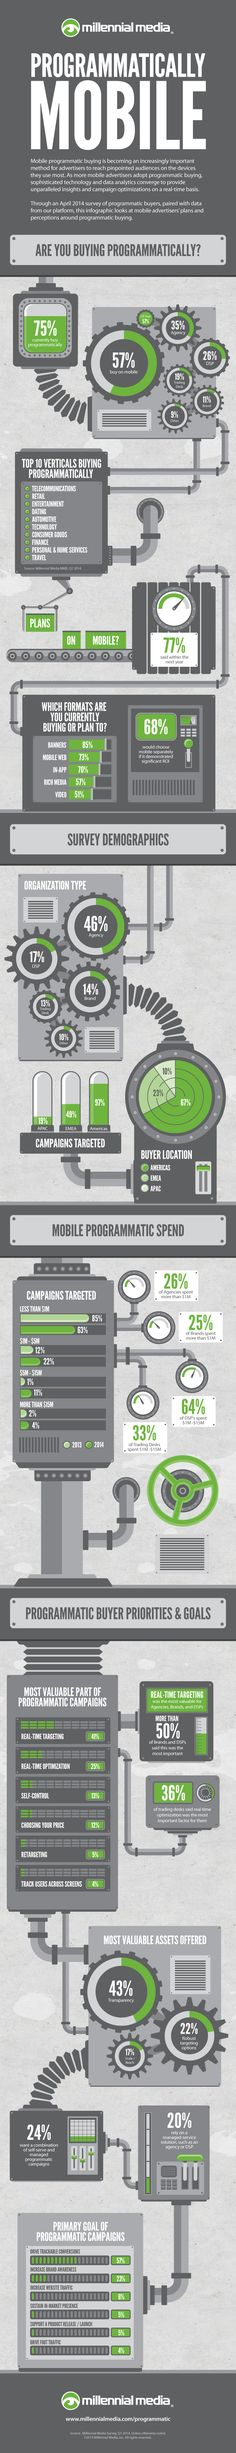 Programmatically Mobile | Millennial Media